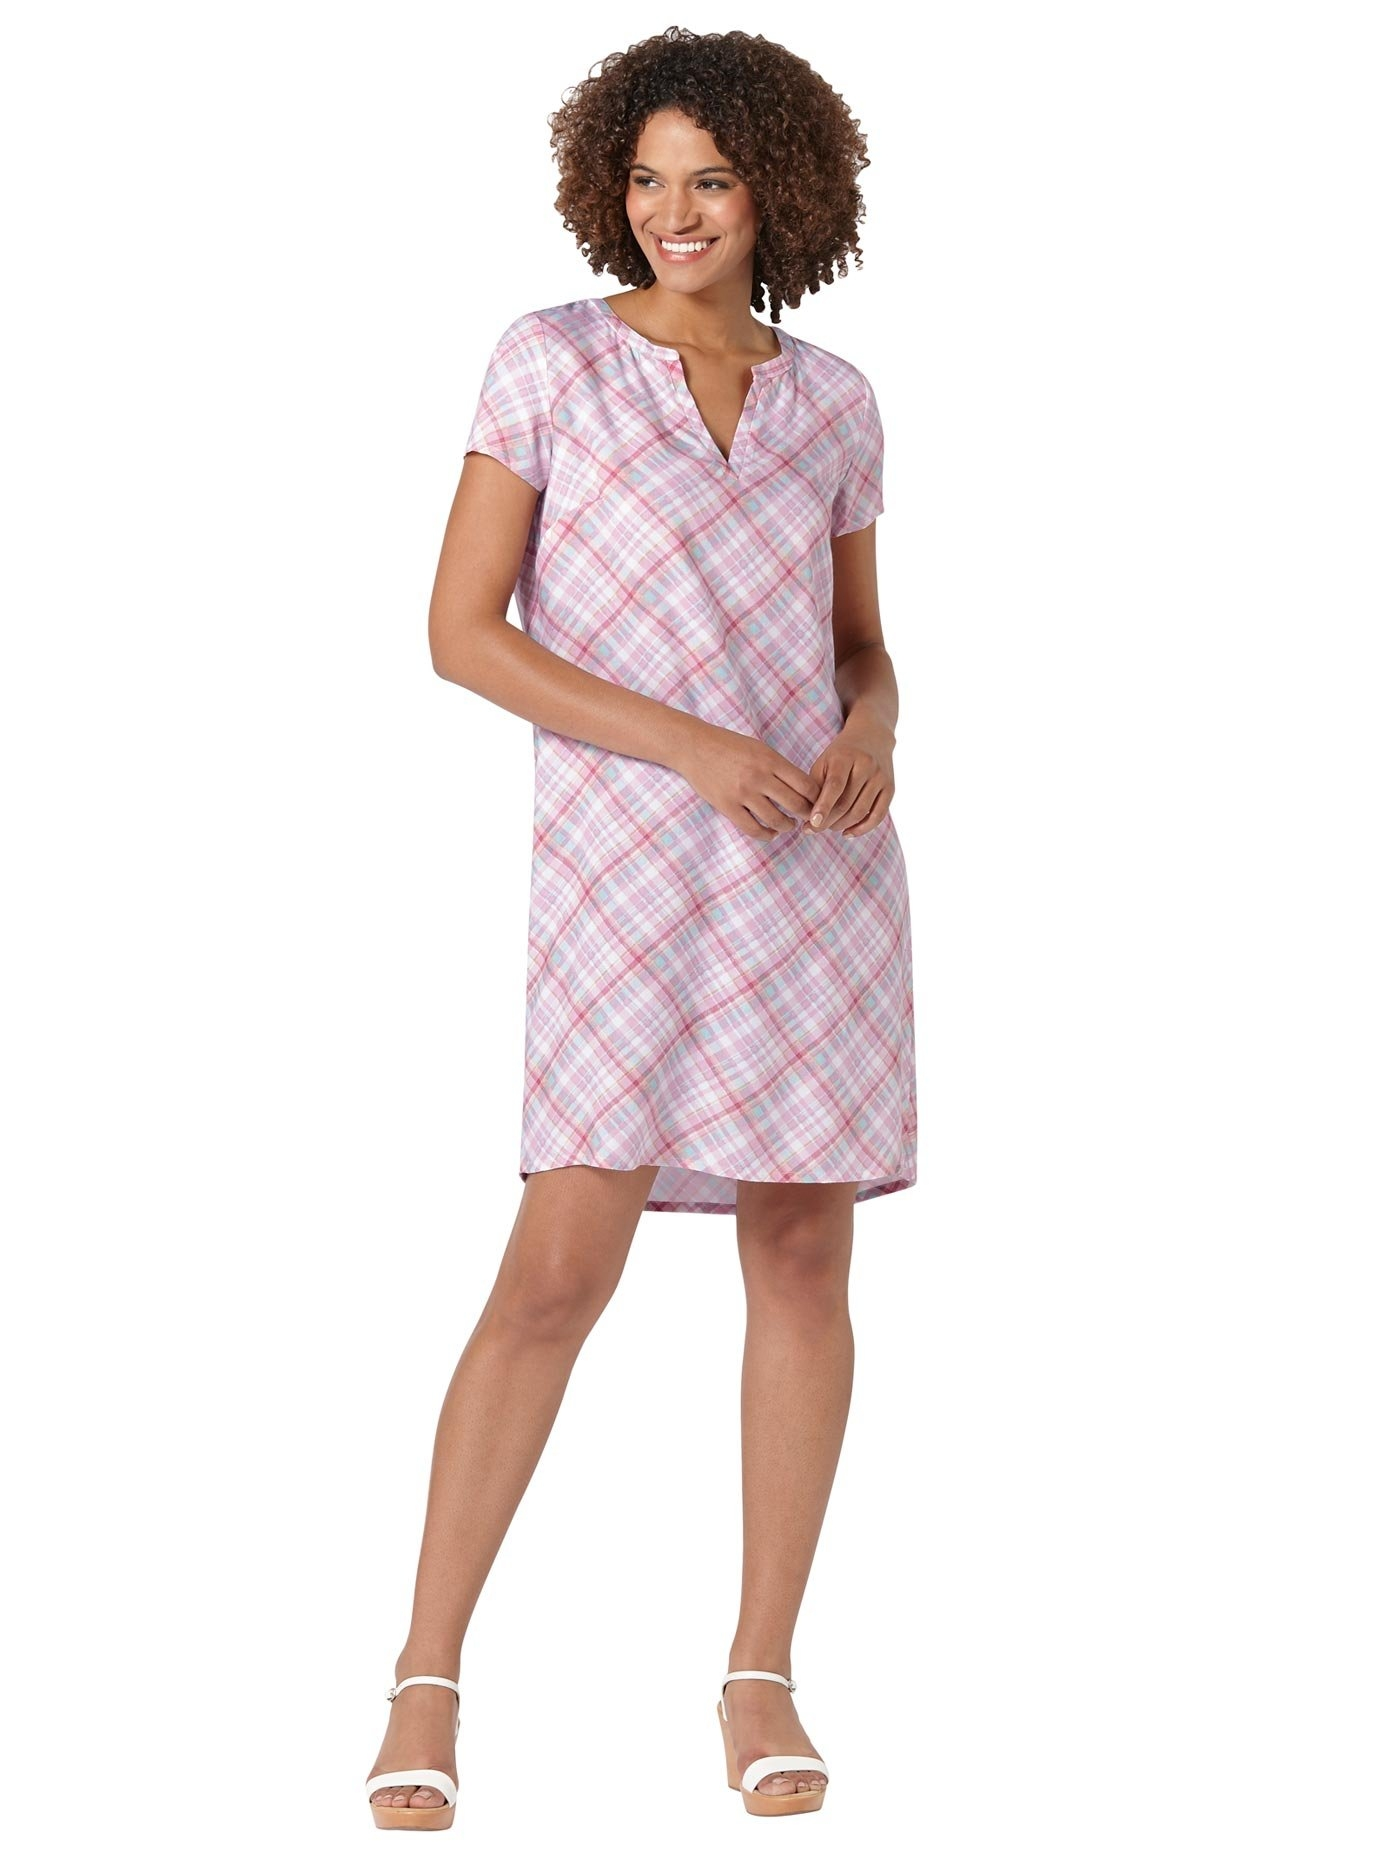 Casual Looks gedessineerde jurk Jurk - verschillende betaalmethodes